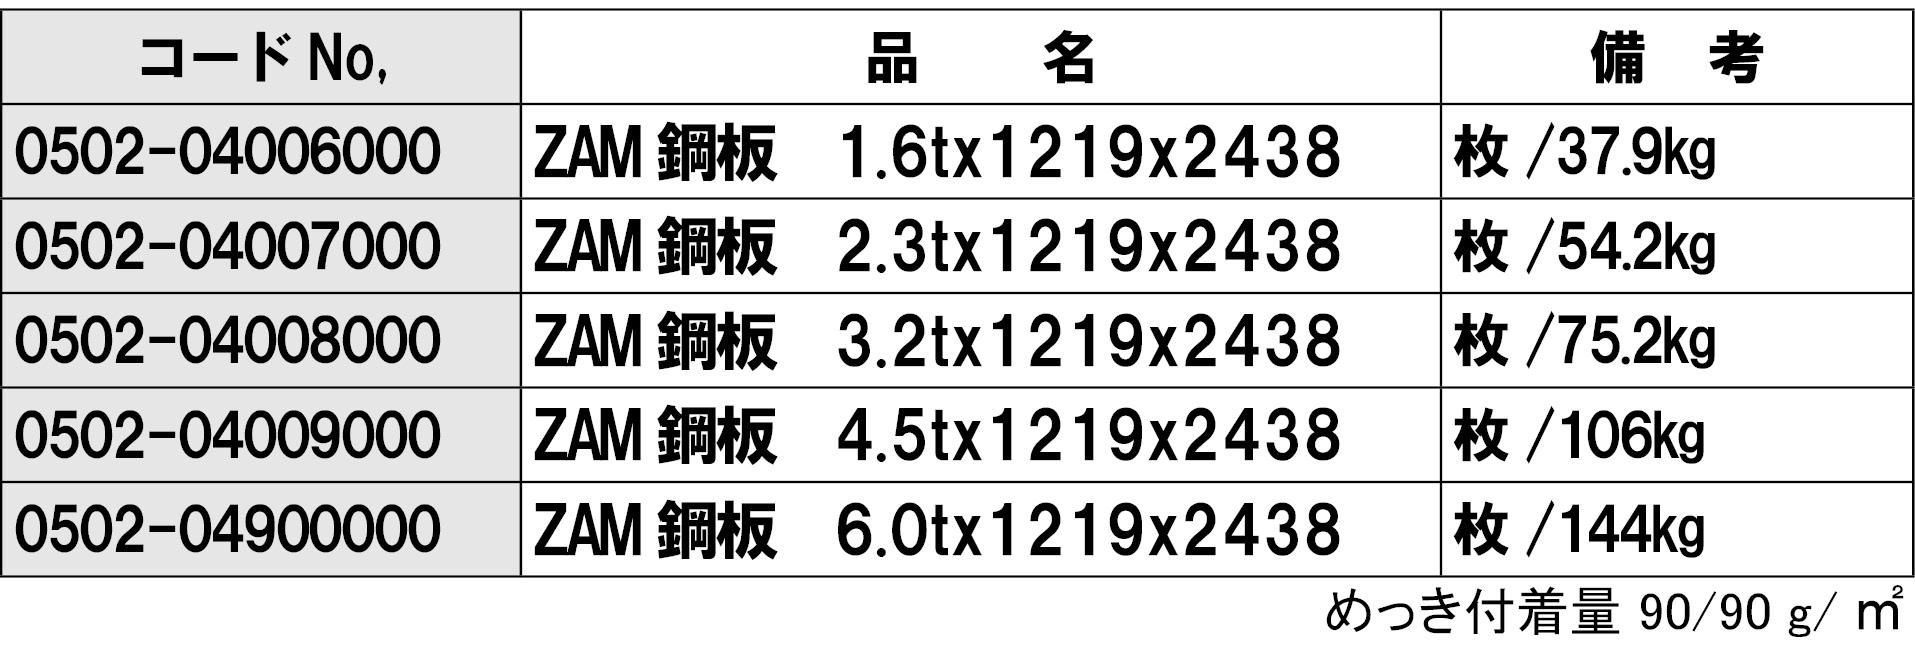 0502-04006000